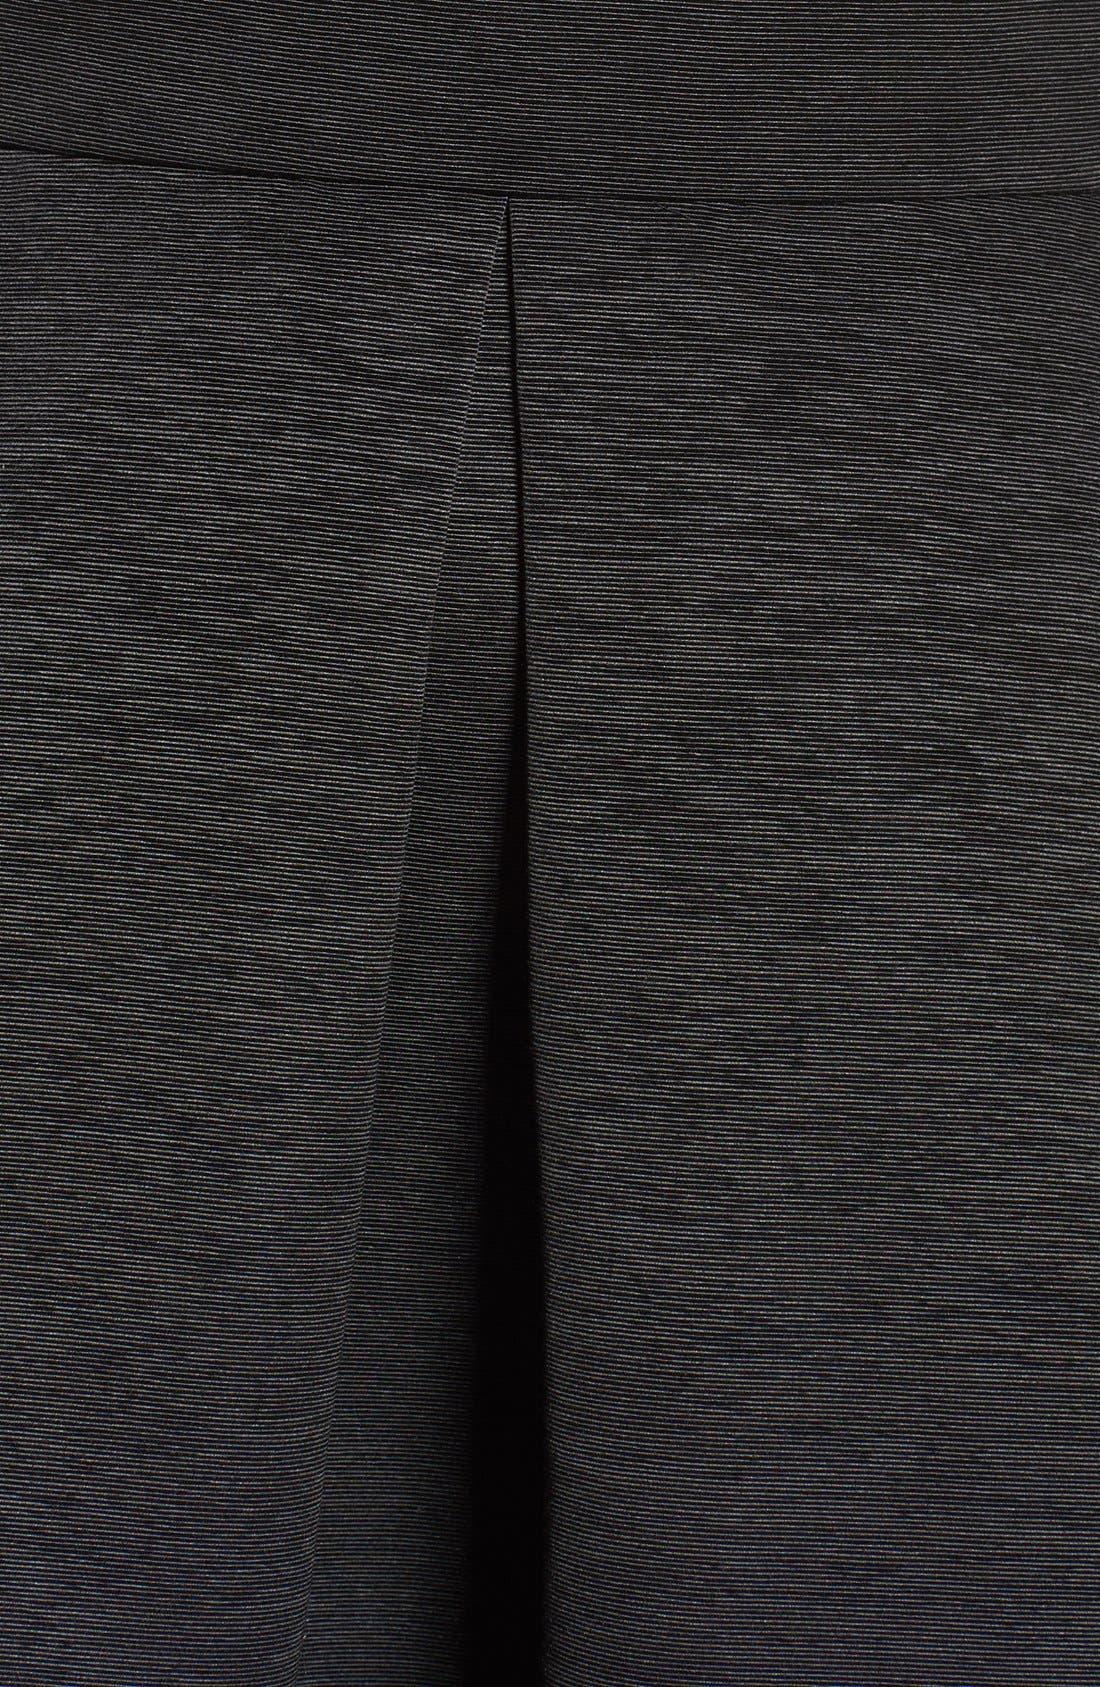 Off the Shoulder A-Line Dress,                             Alternate thumbnail 9, color,                             BLACK